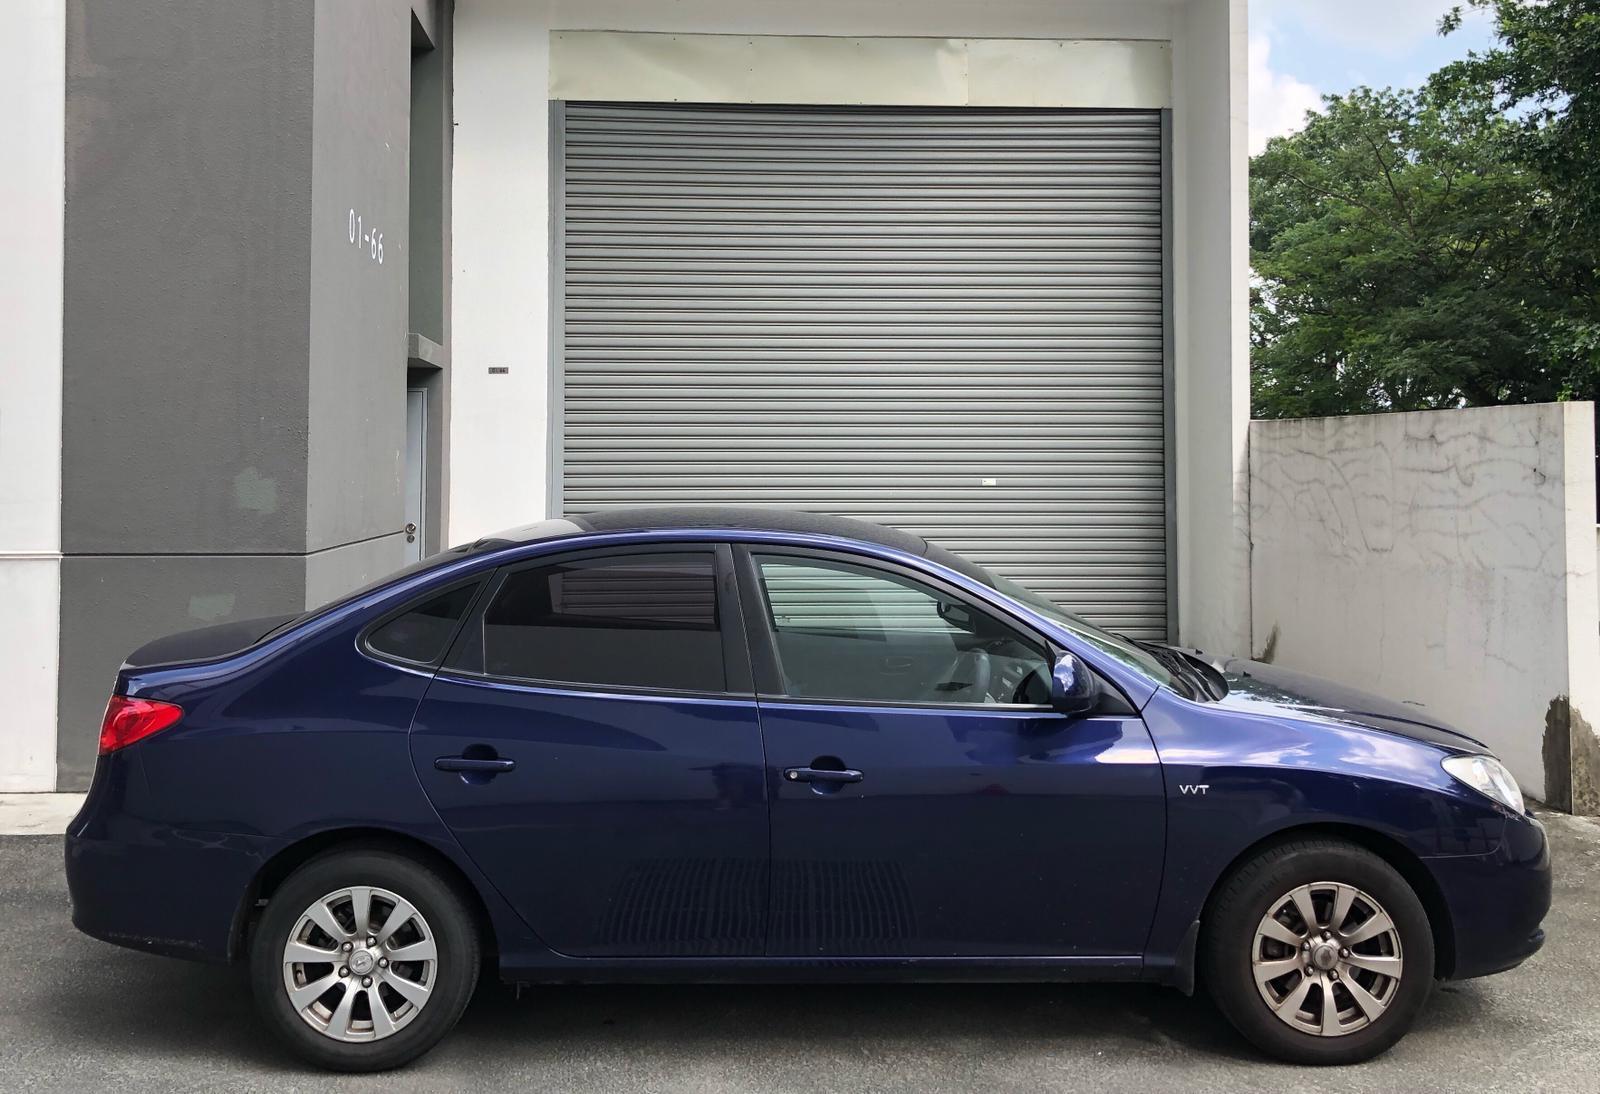 Hyundai avante 1.6a (before gojek rebate)cheapest rental toyota altis allion jazz camry hyundai avantesuitable for grab gojek n personal use.